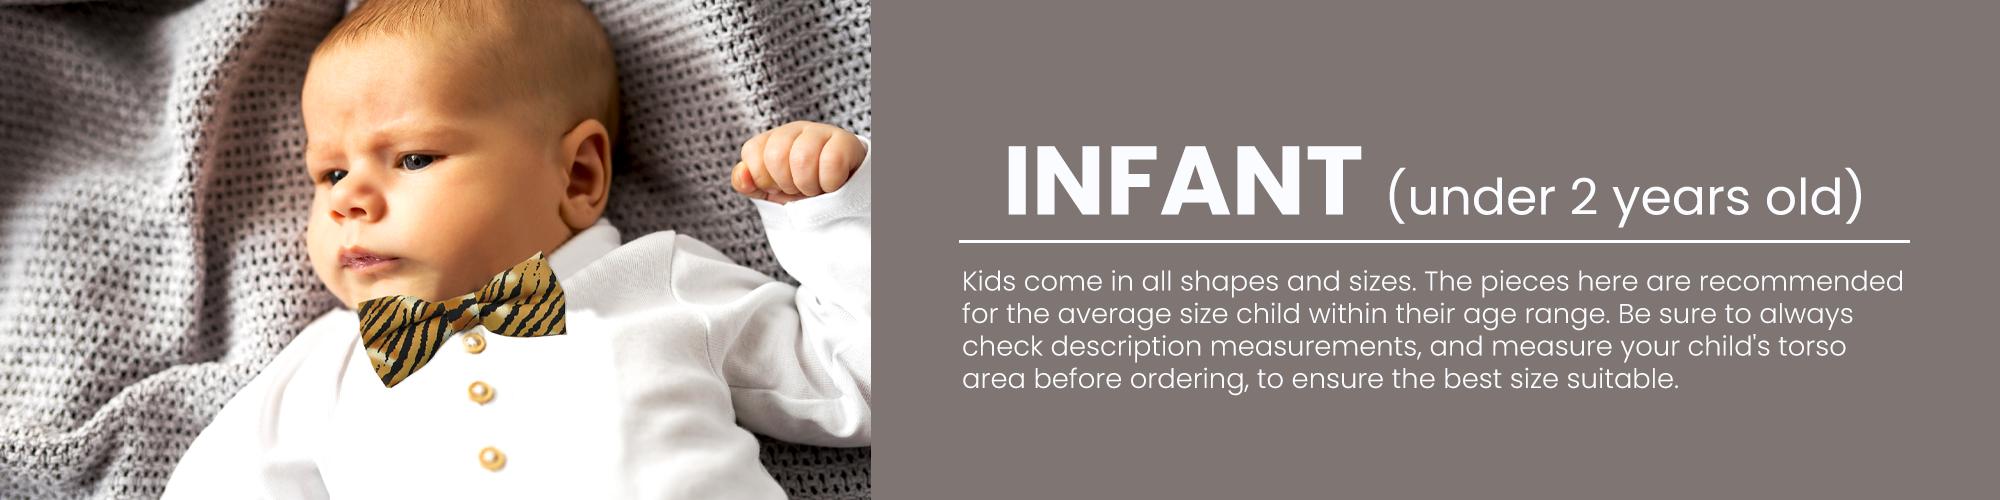 Infant (Under 2 yrs